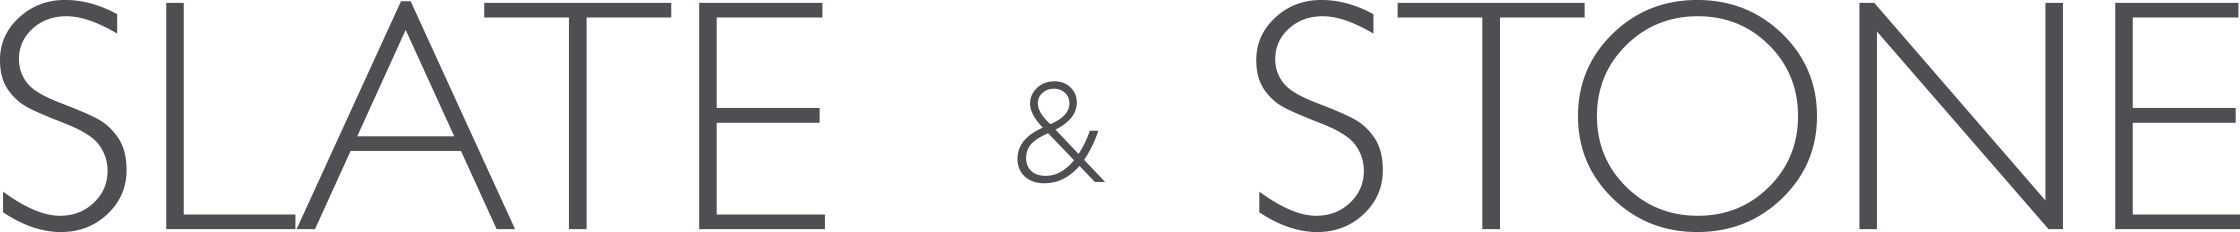 slate&stone-logo.png